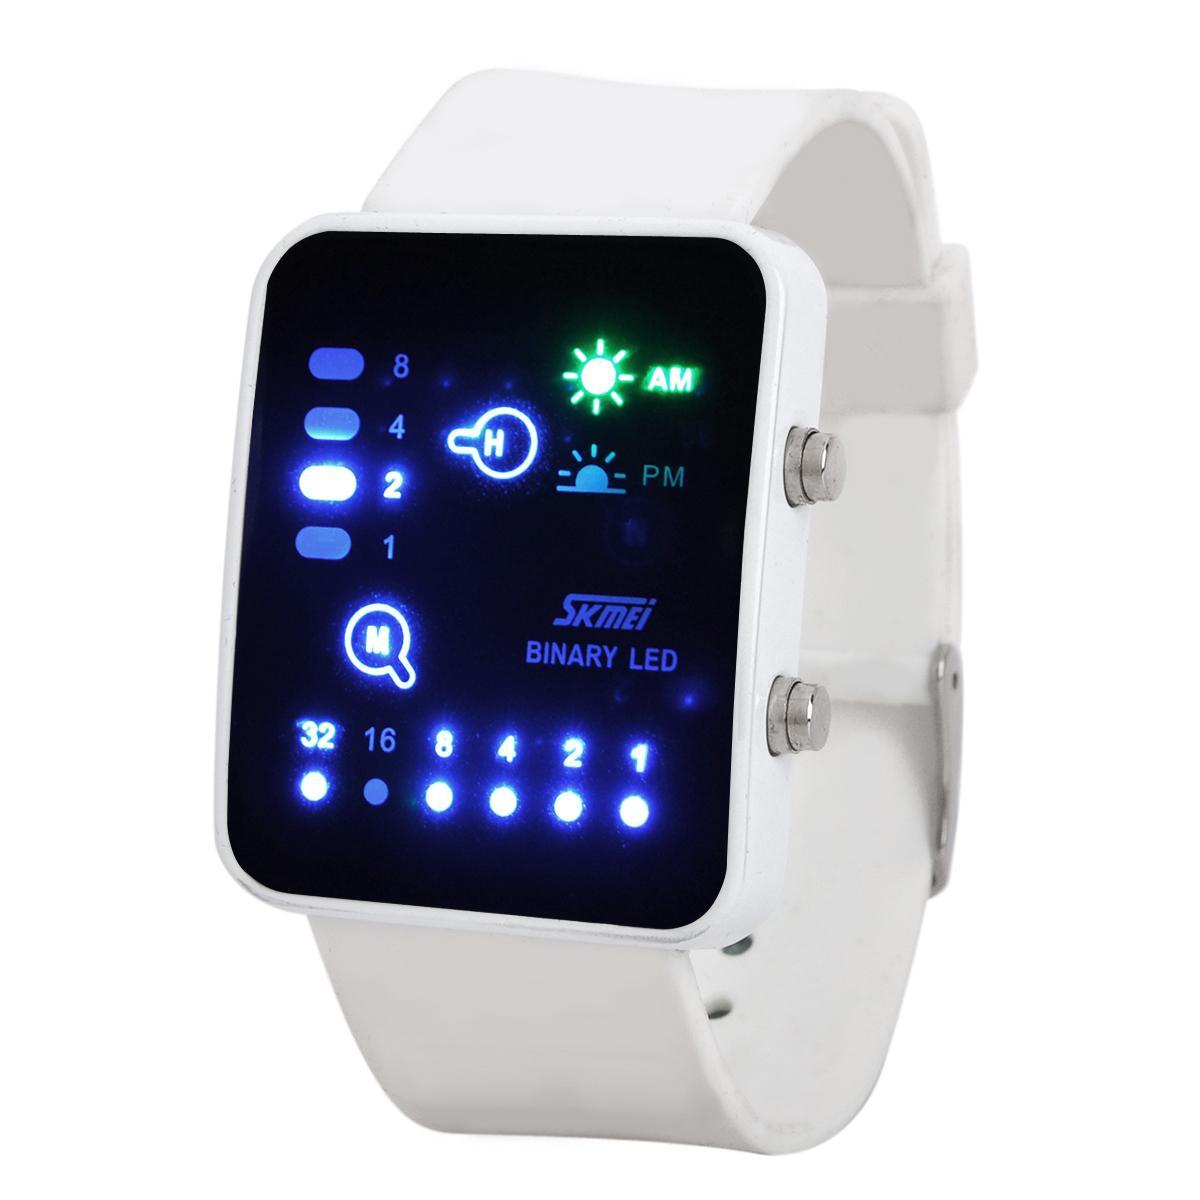 Wrist watch on discount - Skmei Wholesale Kids Digital Led Wrist Watch Women Men Student Young Boy Girl Fashion Lover Stylish